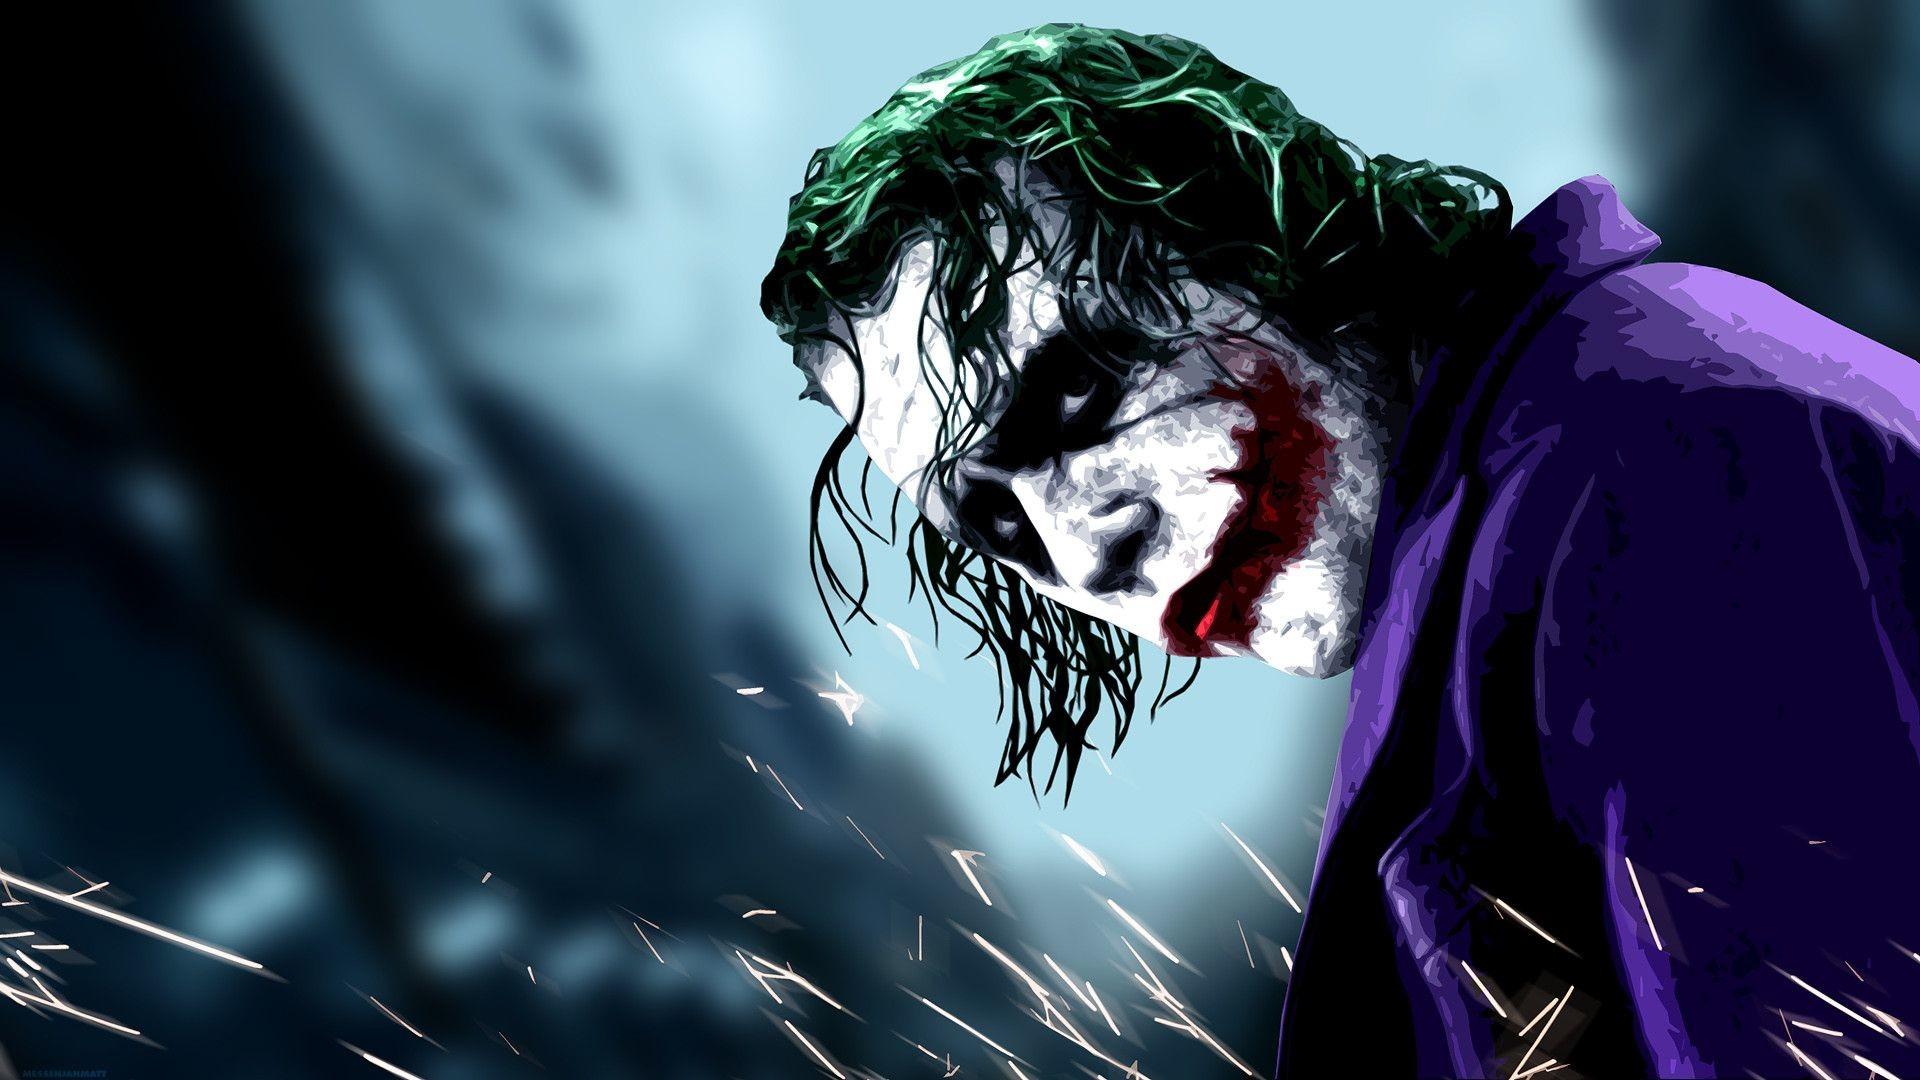 Heath Ledger Joker Wallpaper ·① WallpaperTag